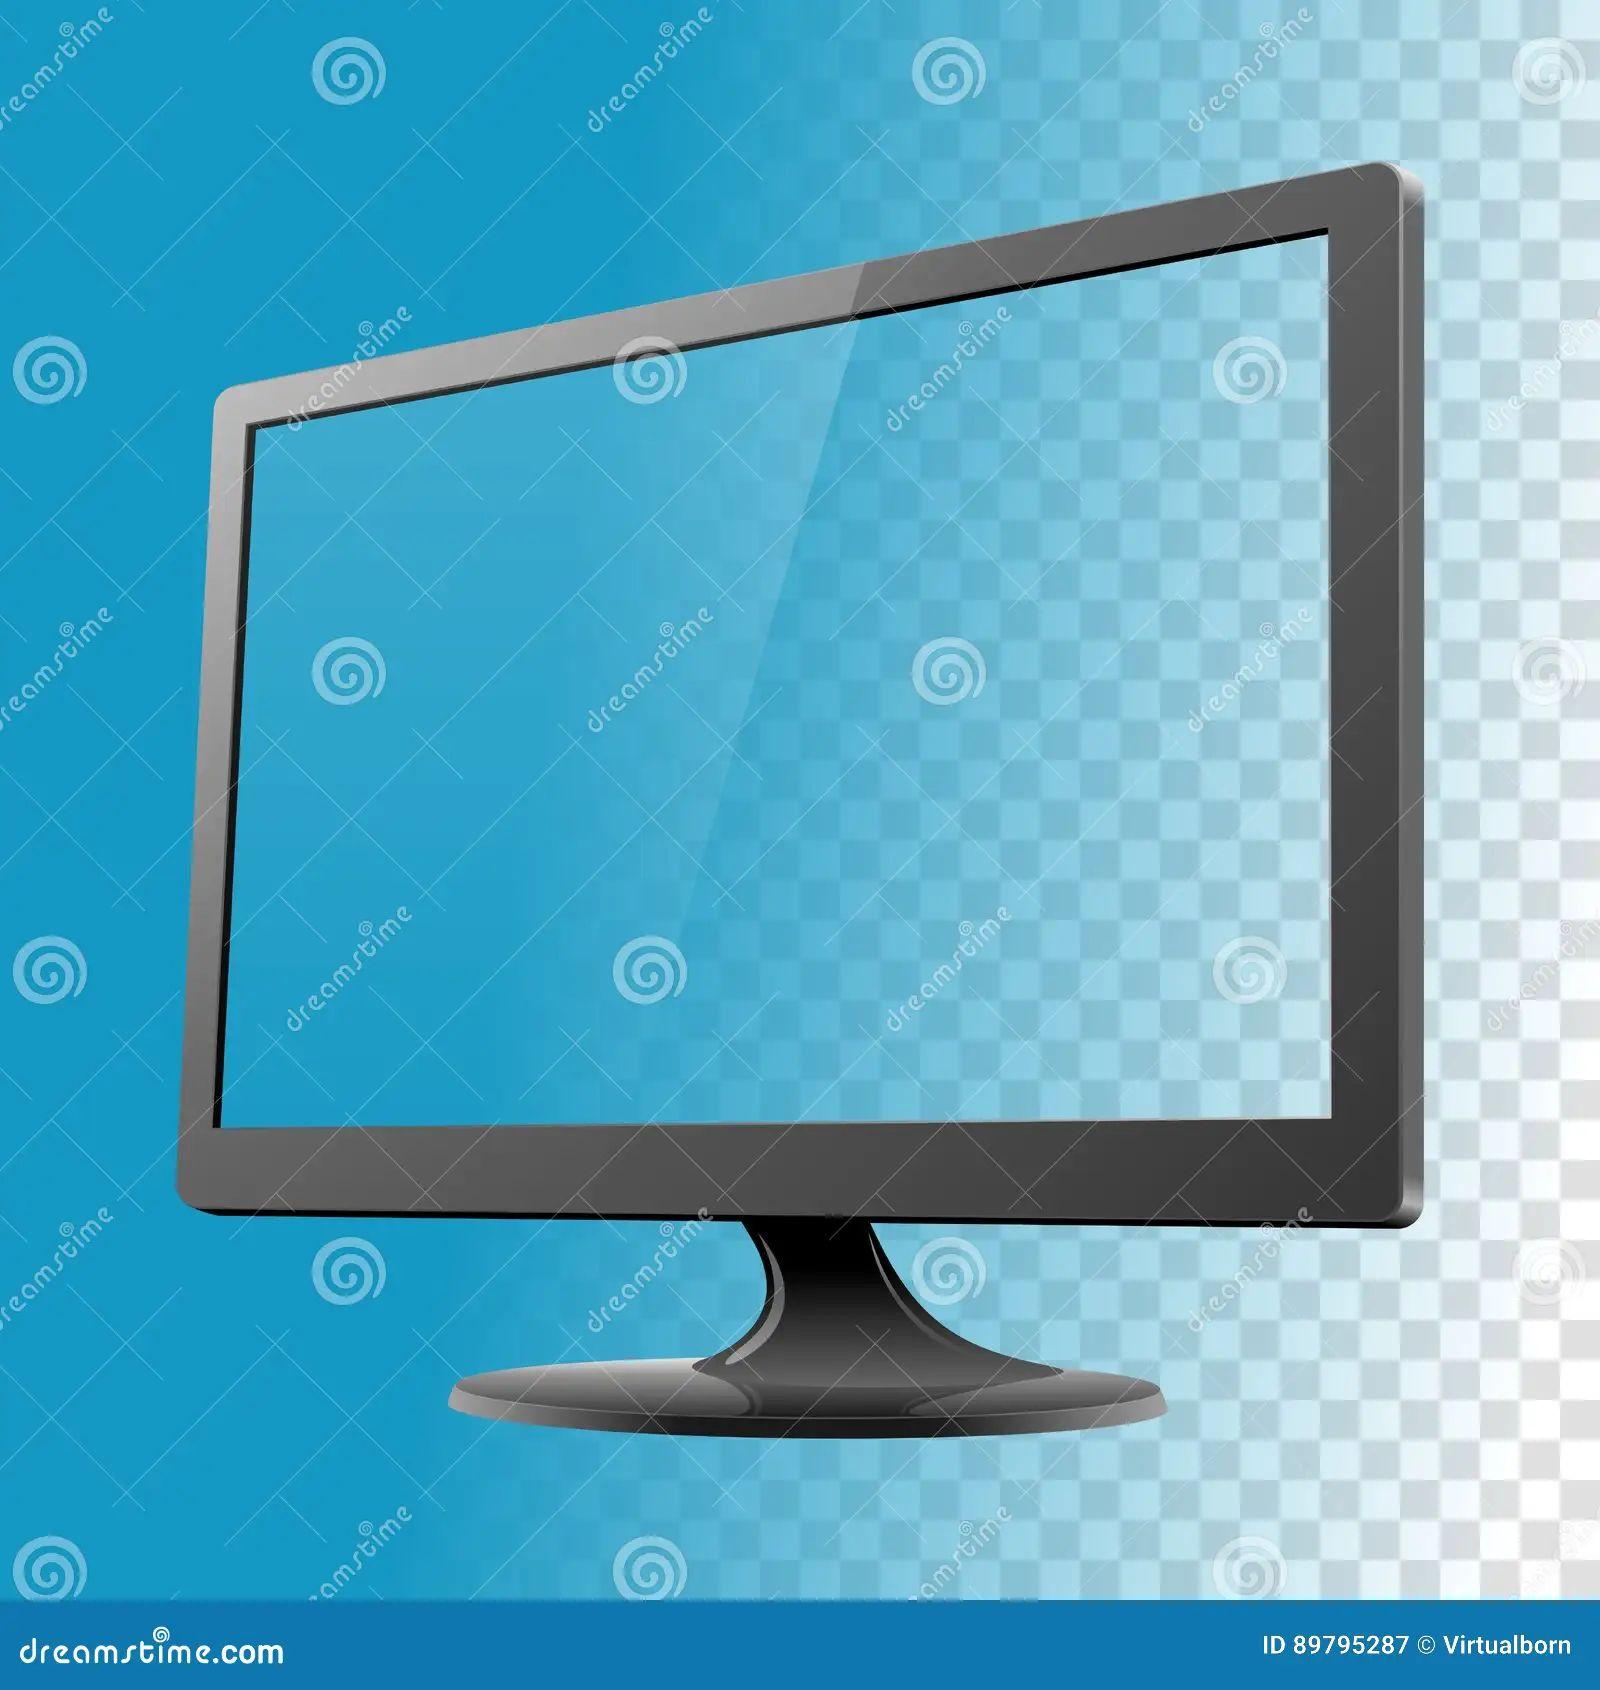 Computer Monitor Mockup Vector Illustration Stock Vector